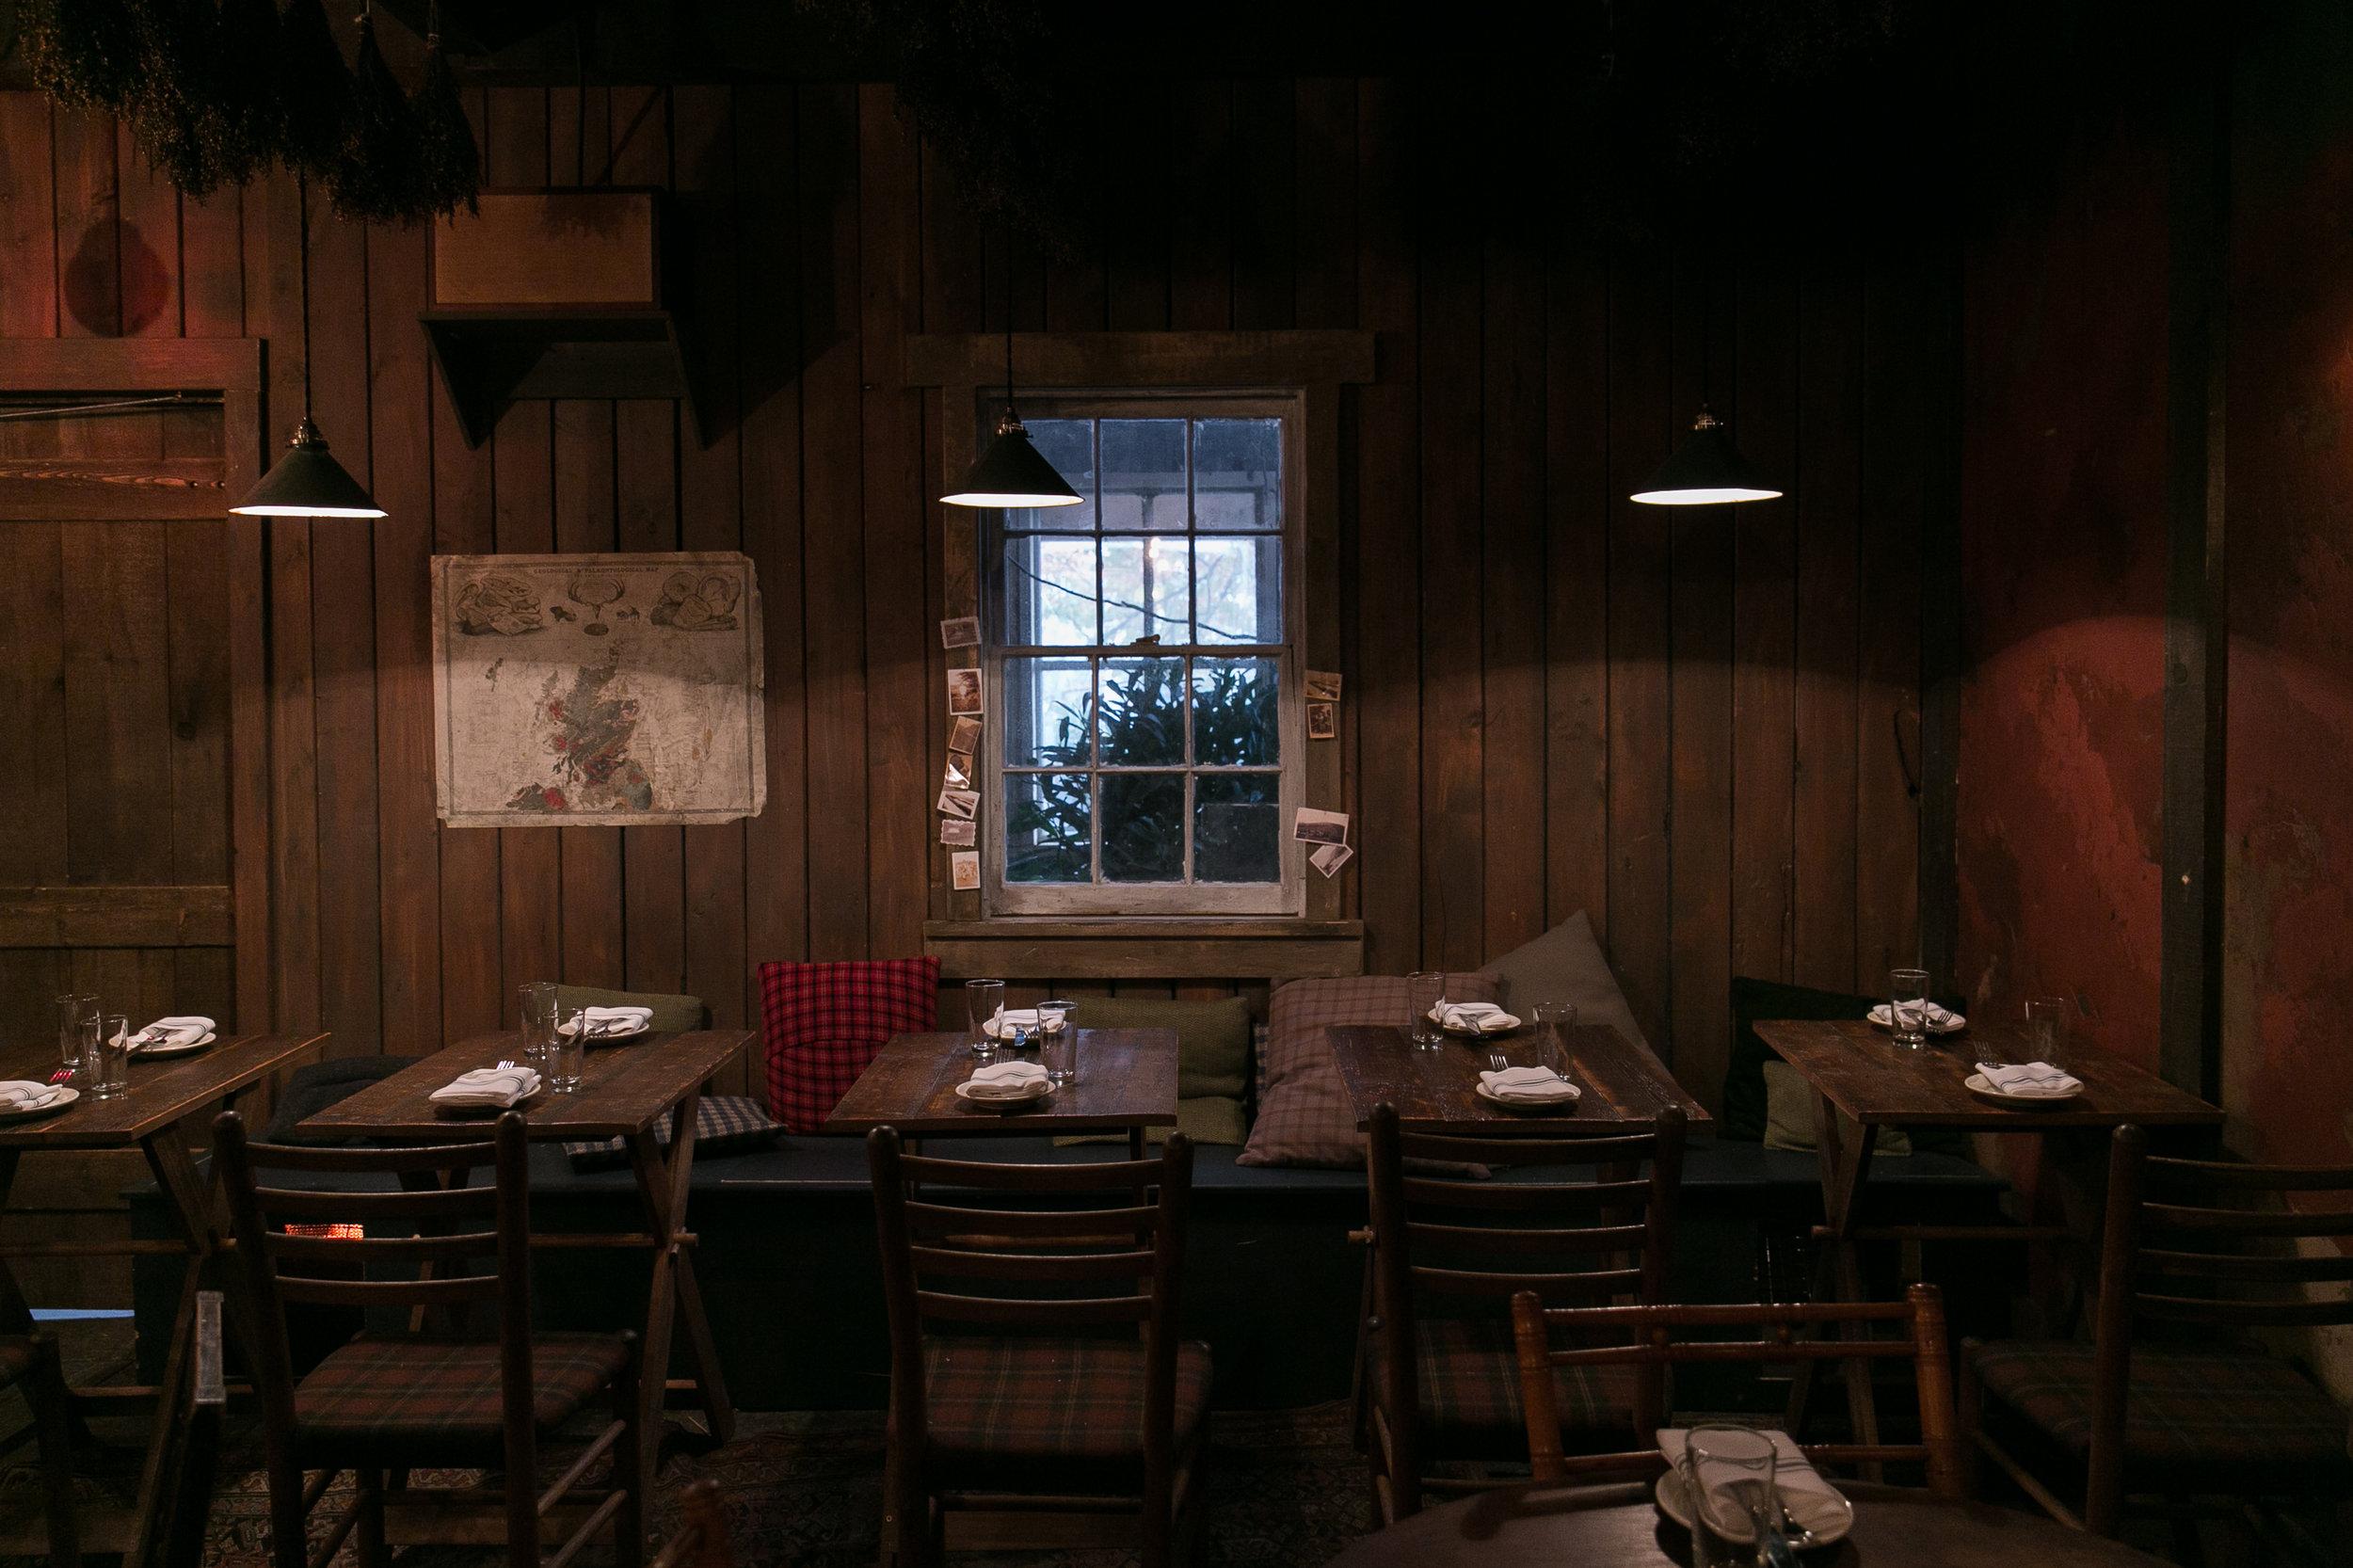 The-Lodge-Main-Dining-Room-3_Conor-Harrigan.jpg